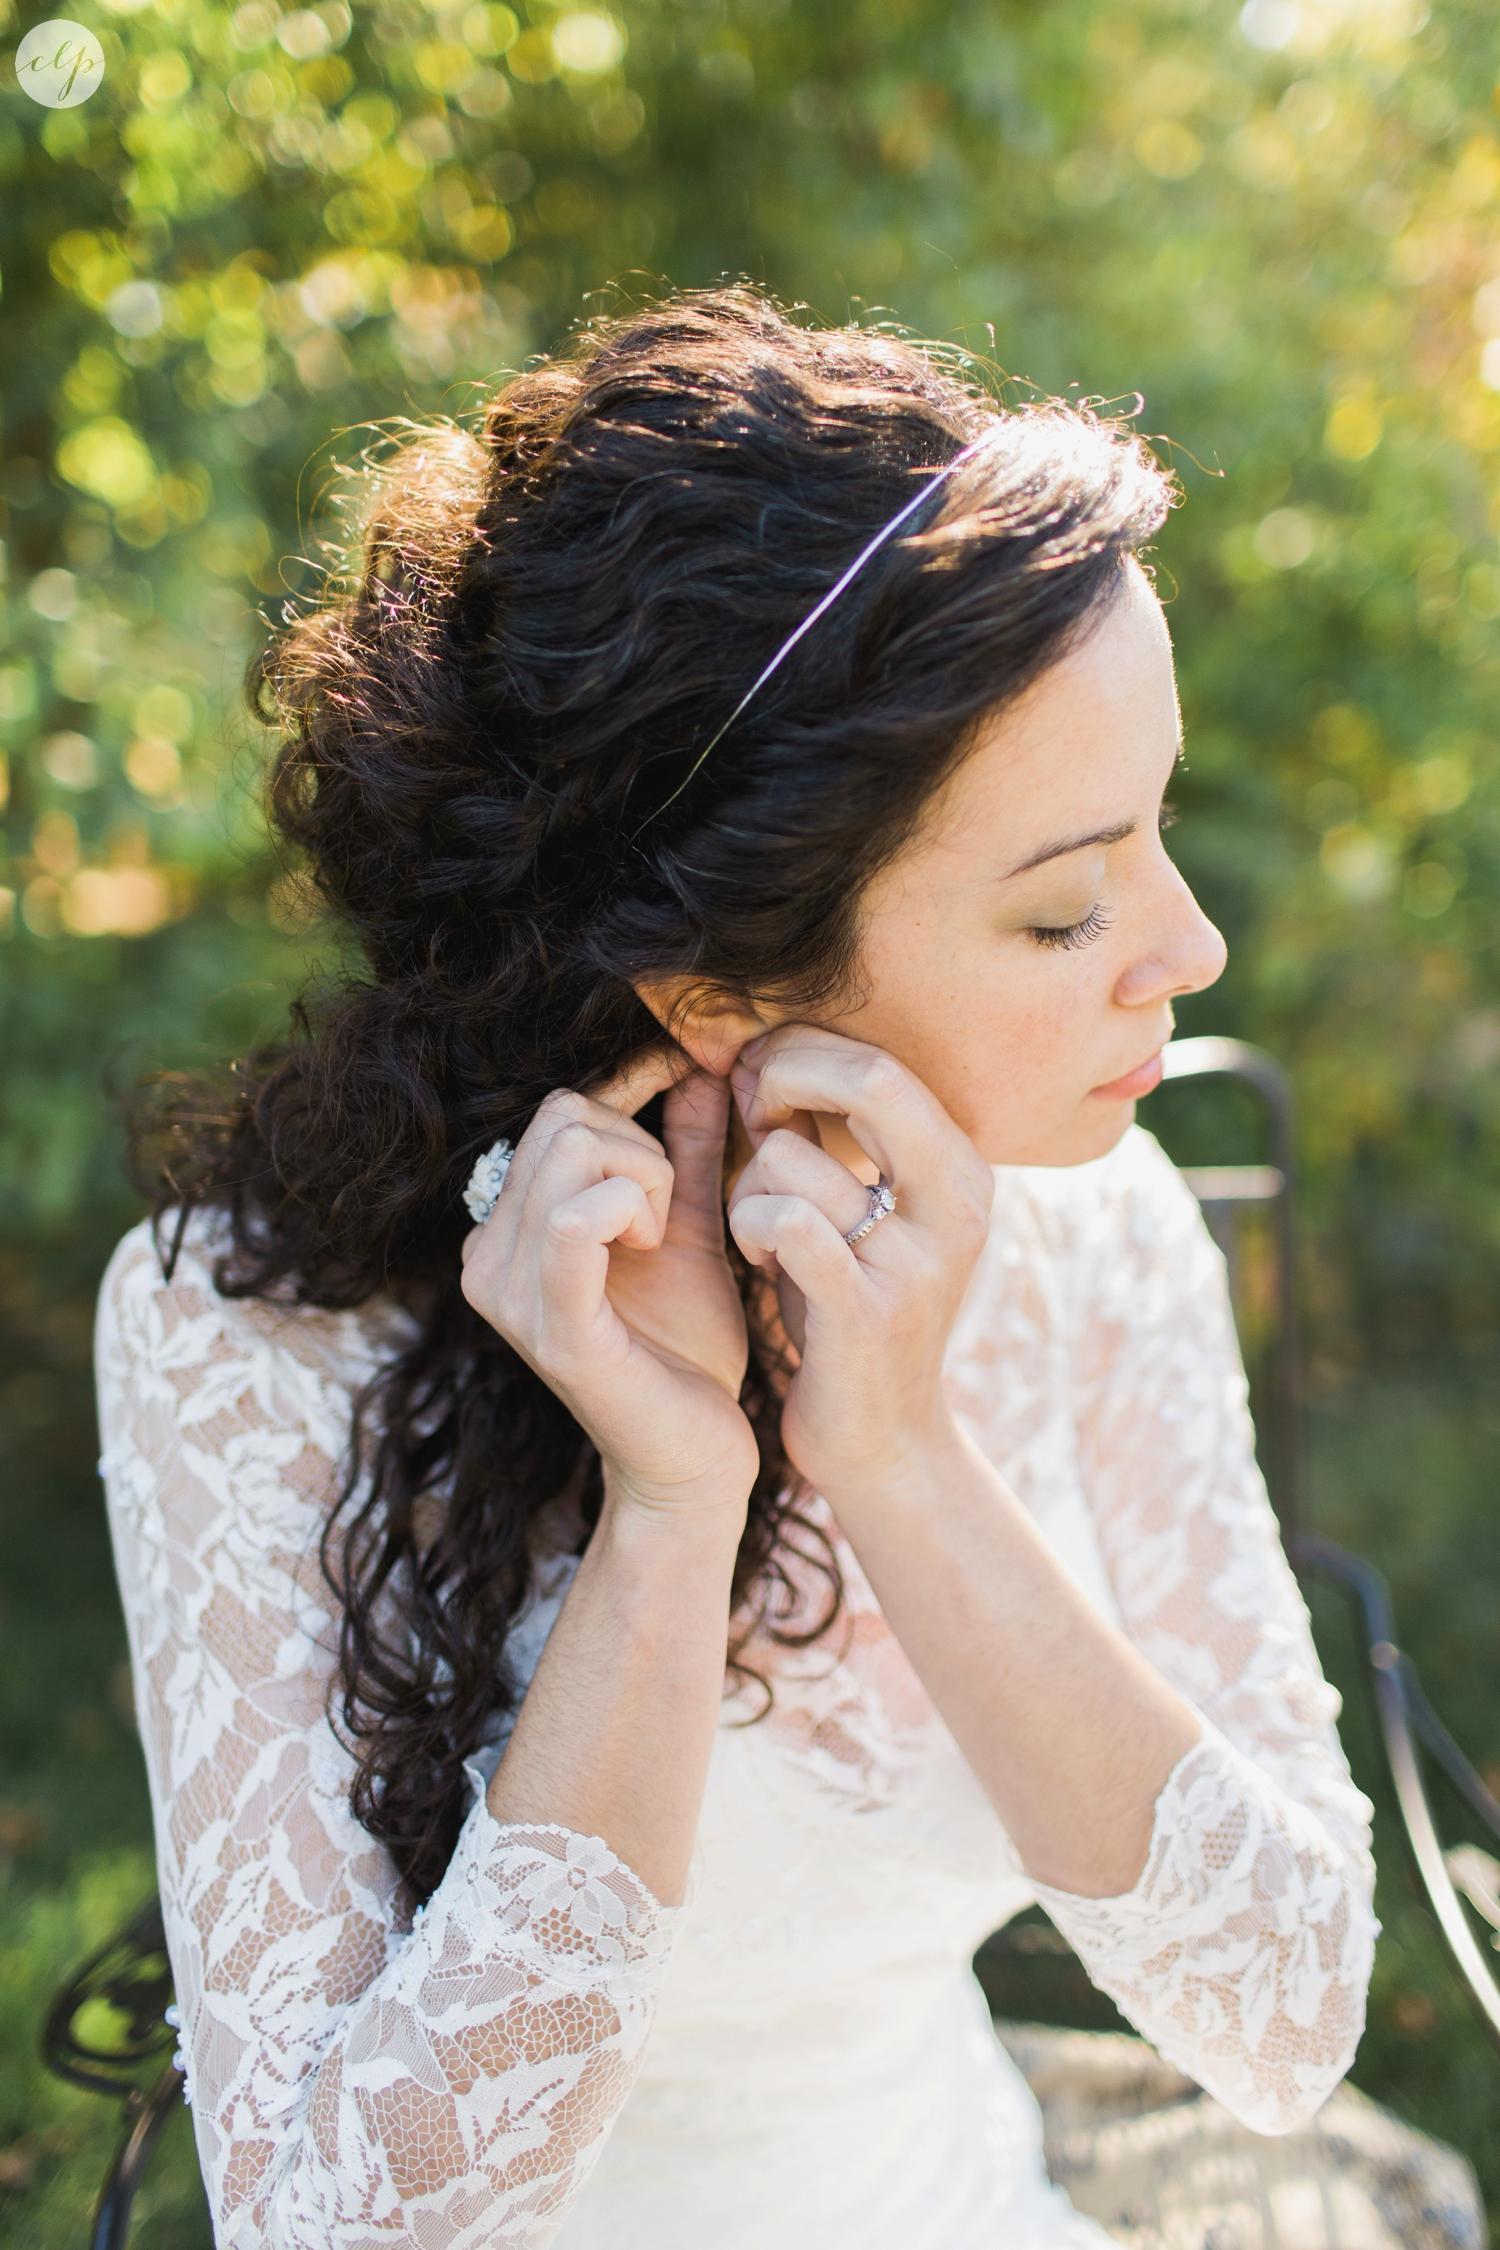 Outdoor-Wedding-in-the-Woods-Photography_4176.jpg